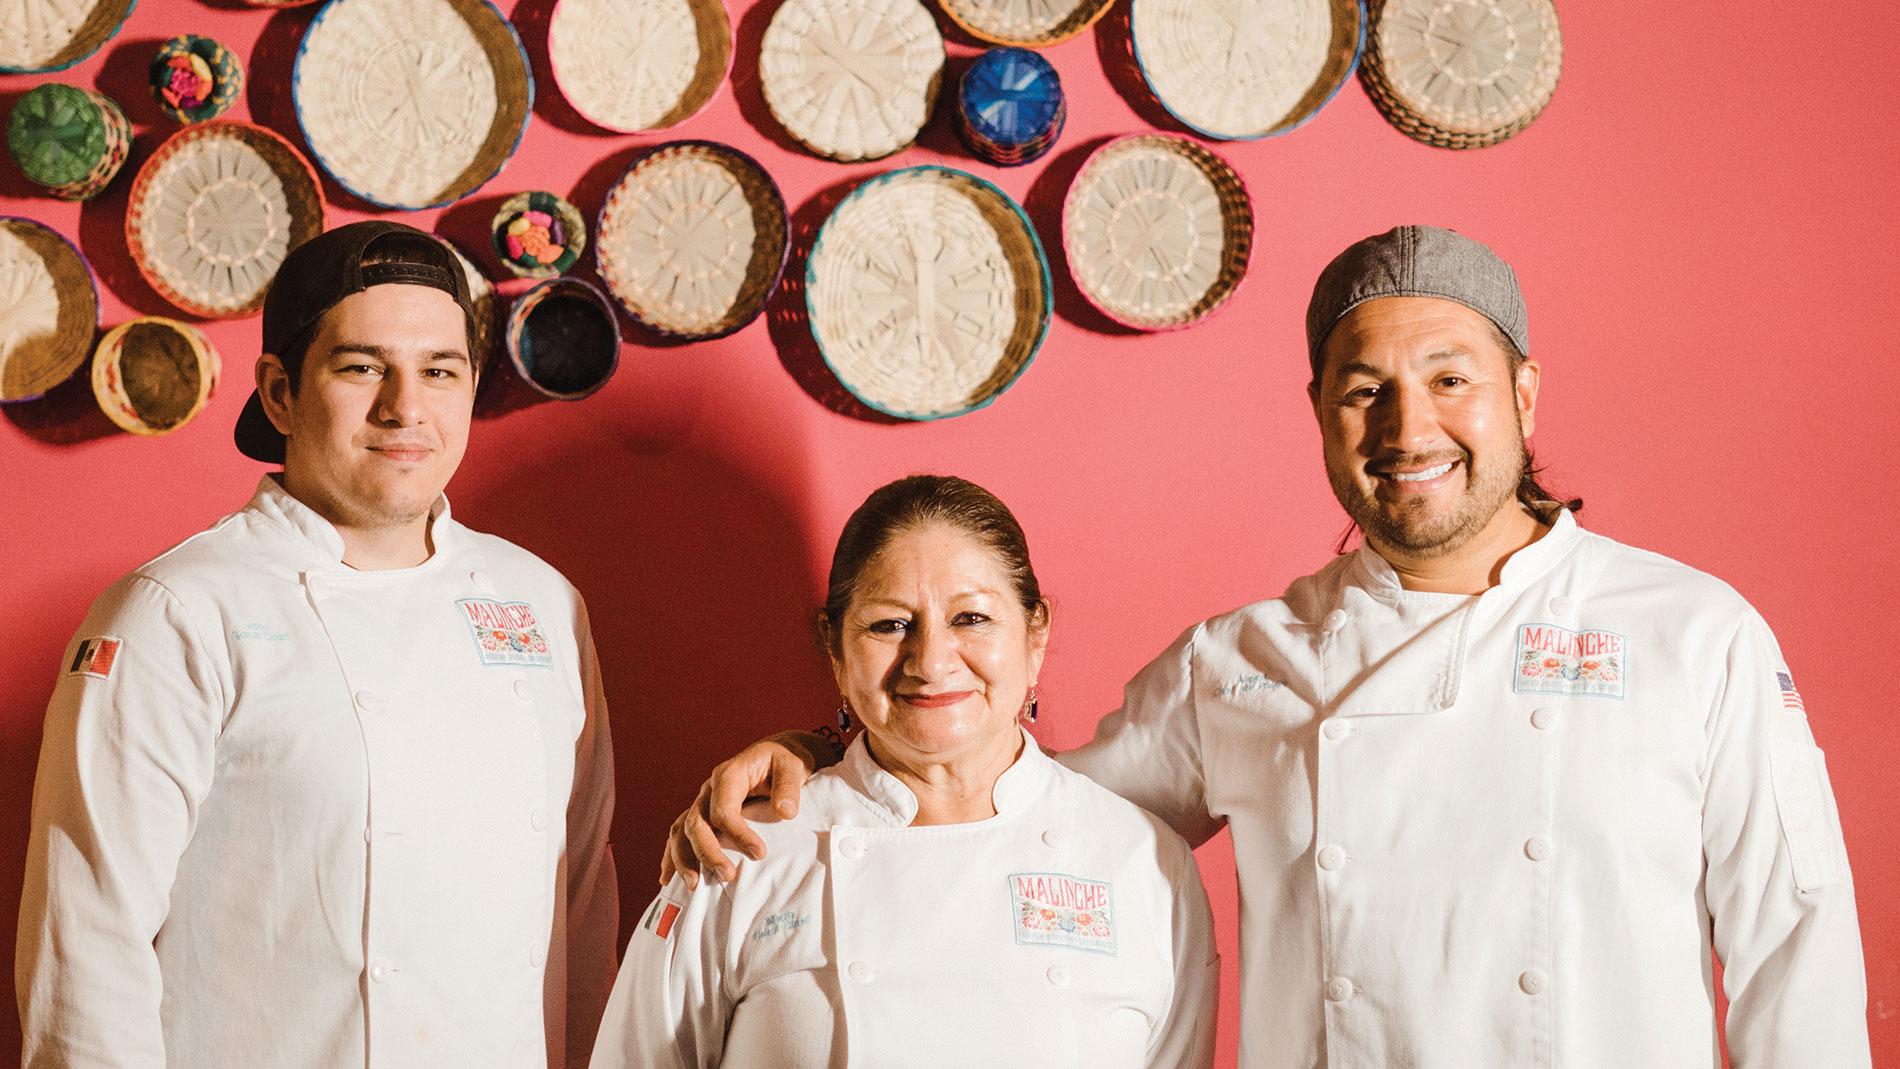 malinche sous chef john howe, head chef maría gutiérrez molina and co-owner angel jiménez-gutiérrez